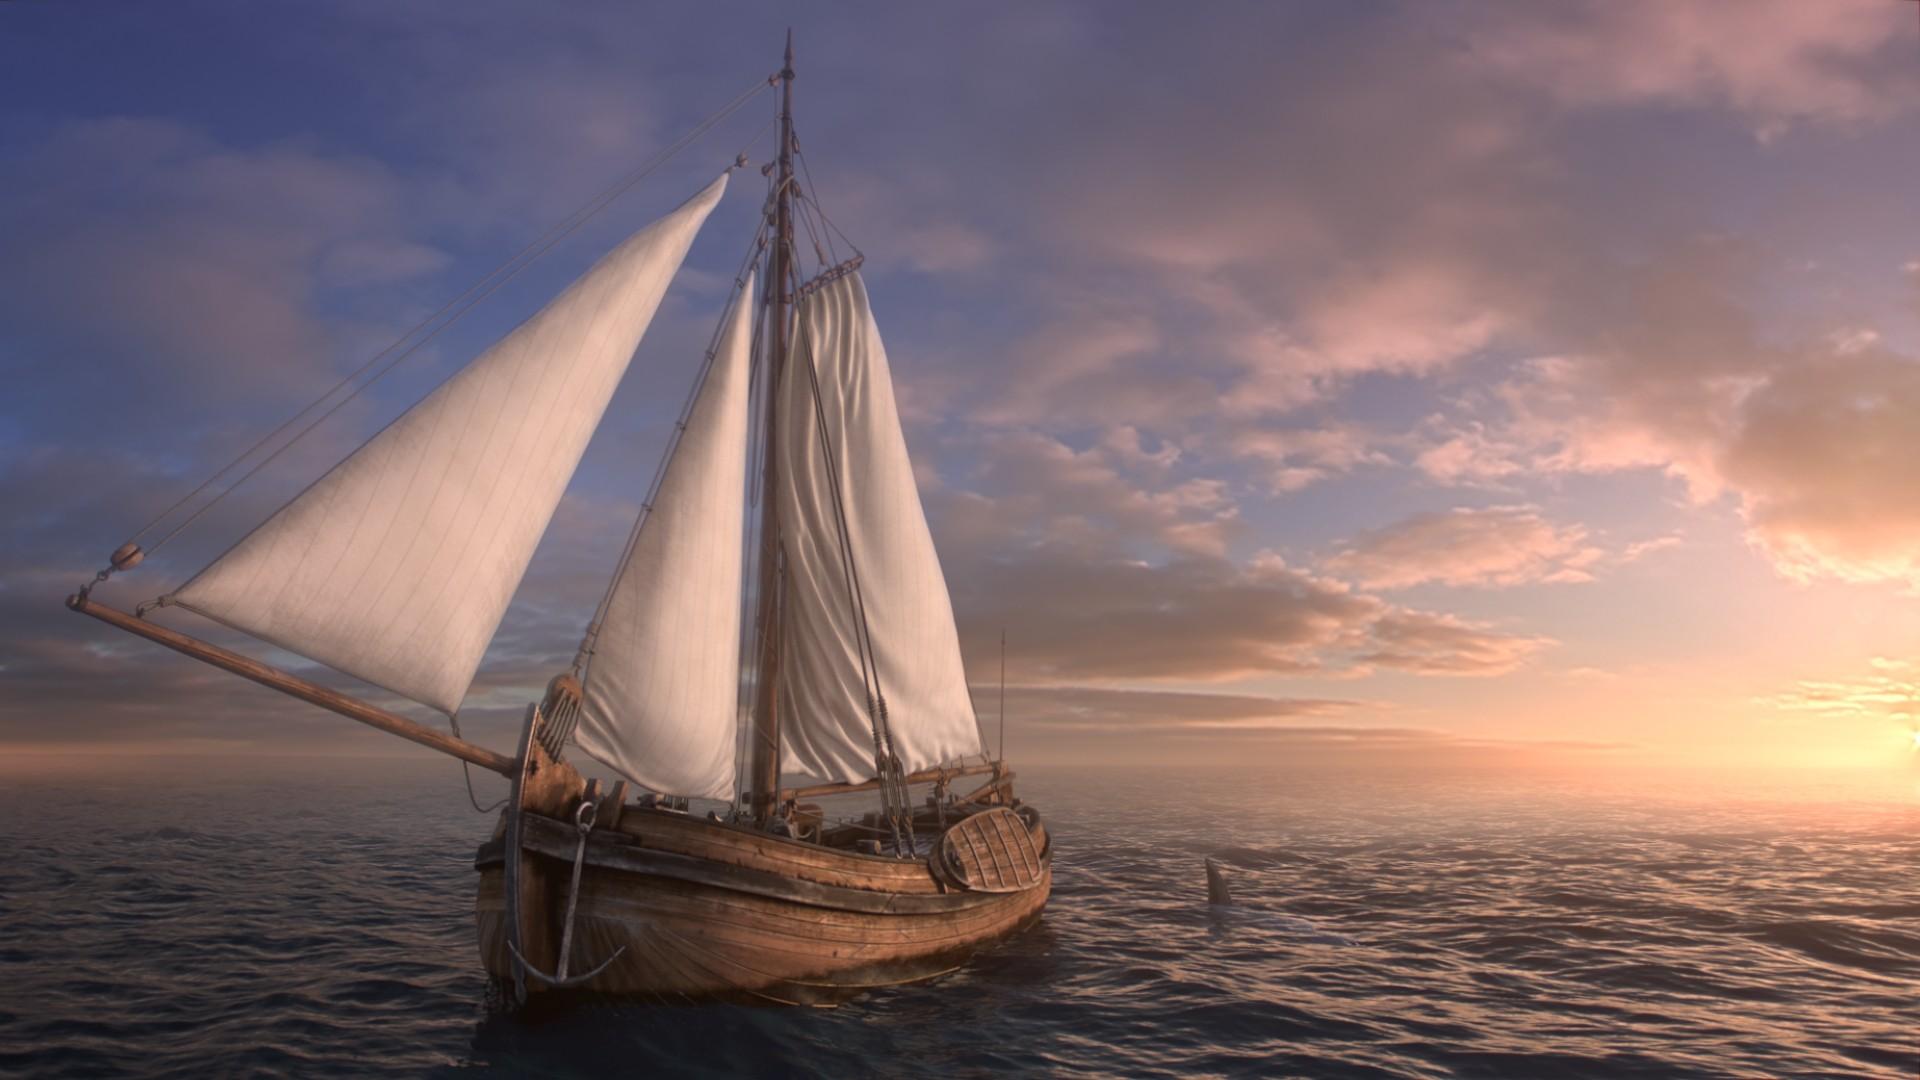 Ship_01.0001.jpg